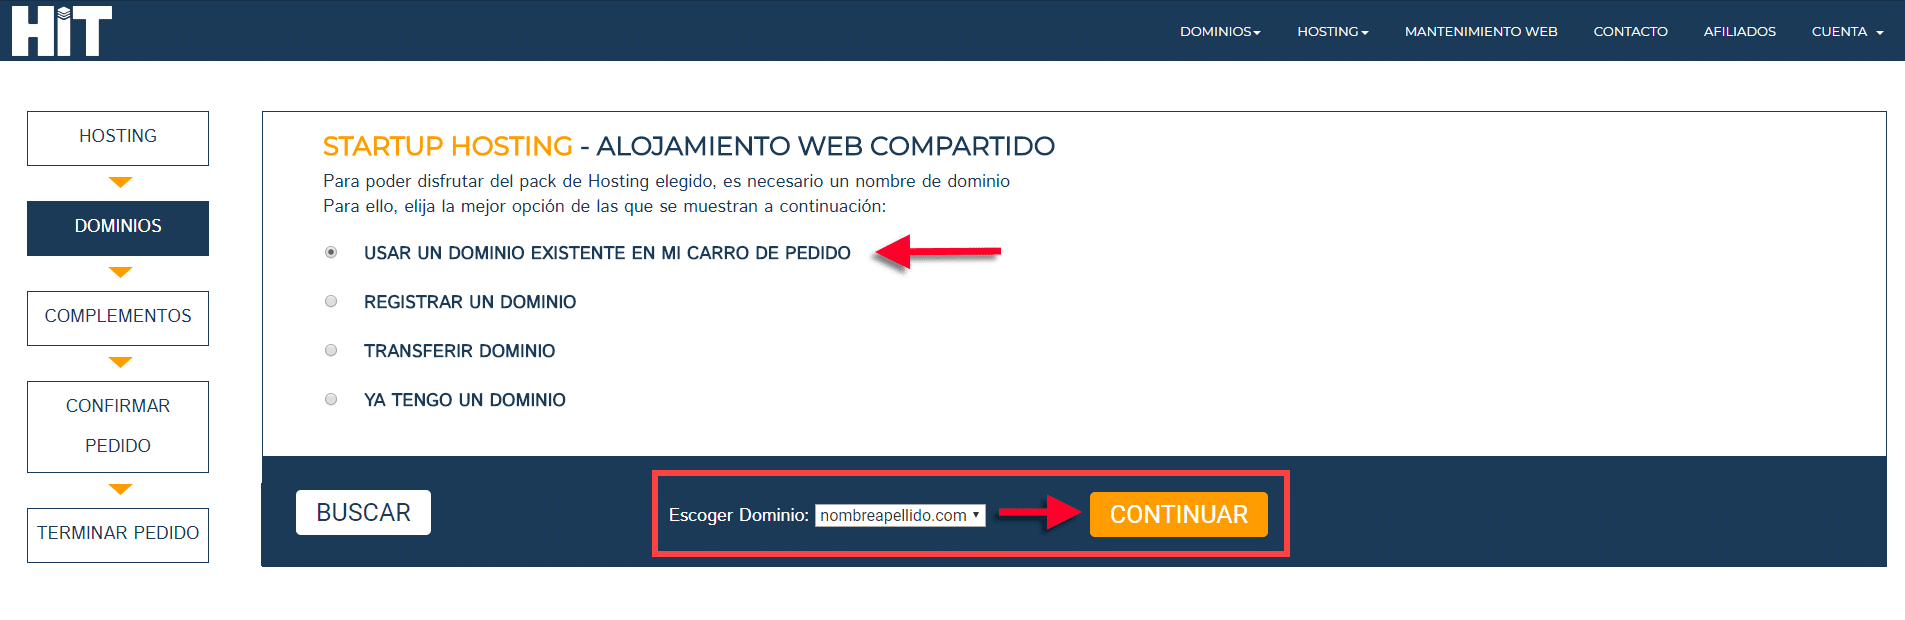 correo-electronico-profesional-verificacion-dominio